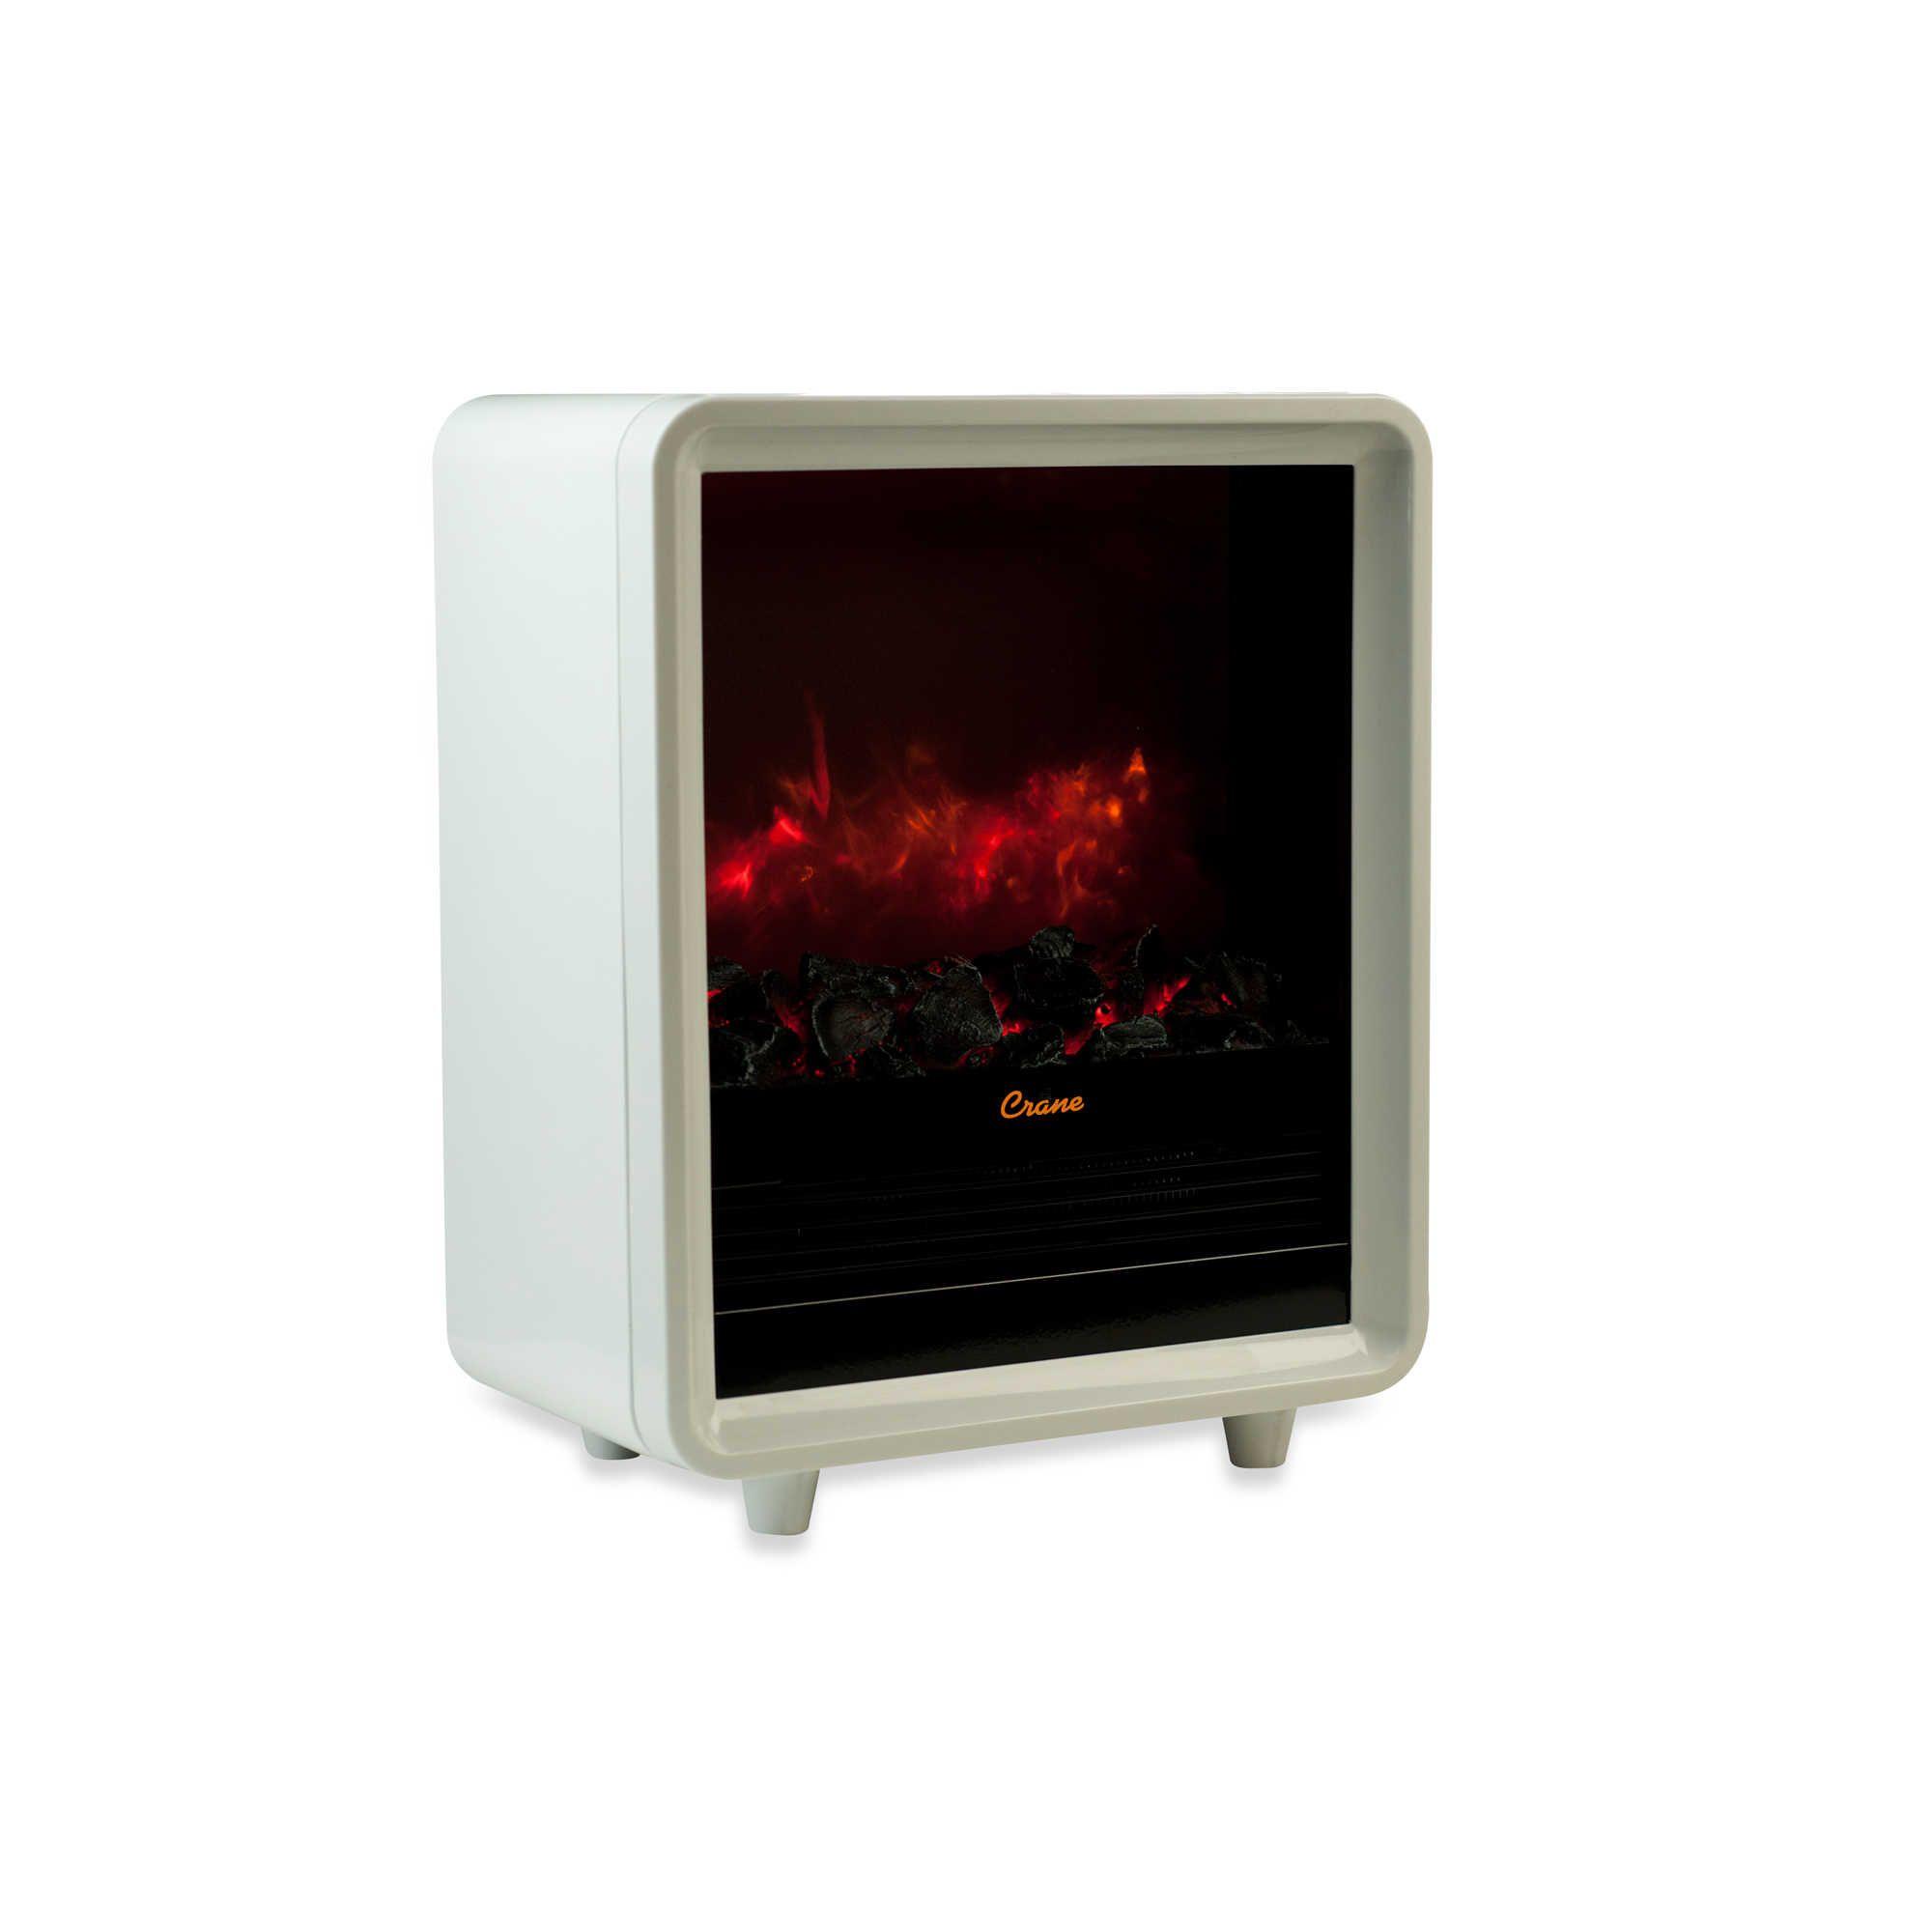 Crane Mini Fireplace Heater In White Fireplace Heater Space